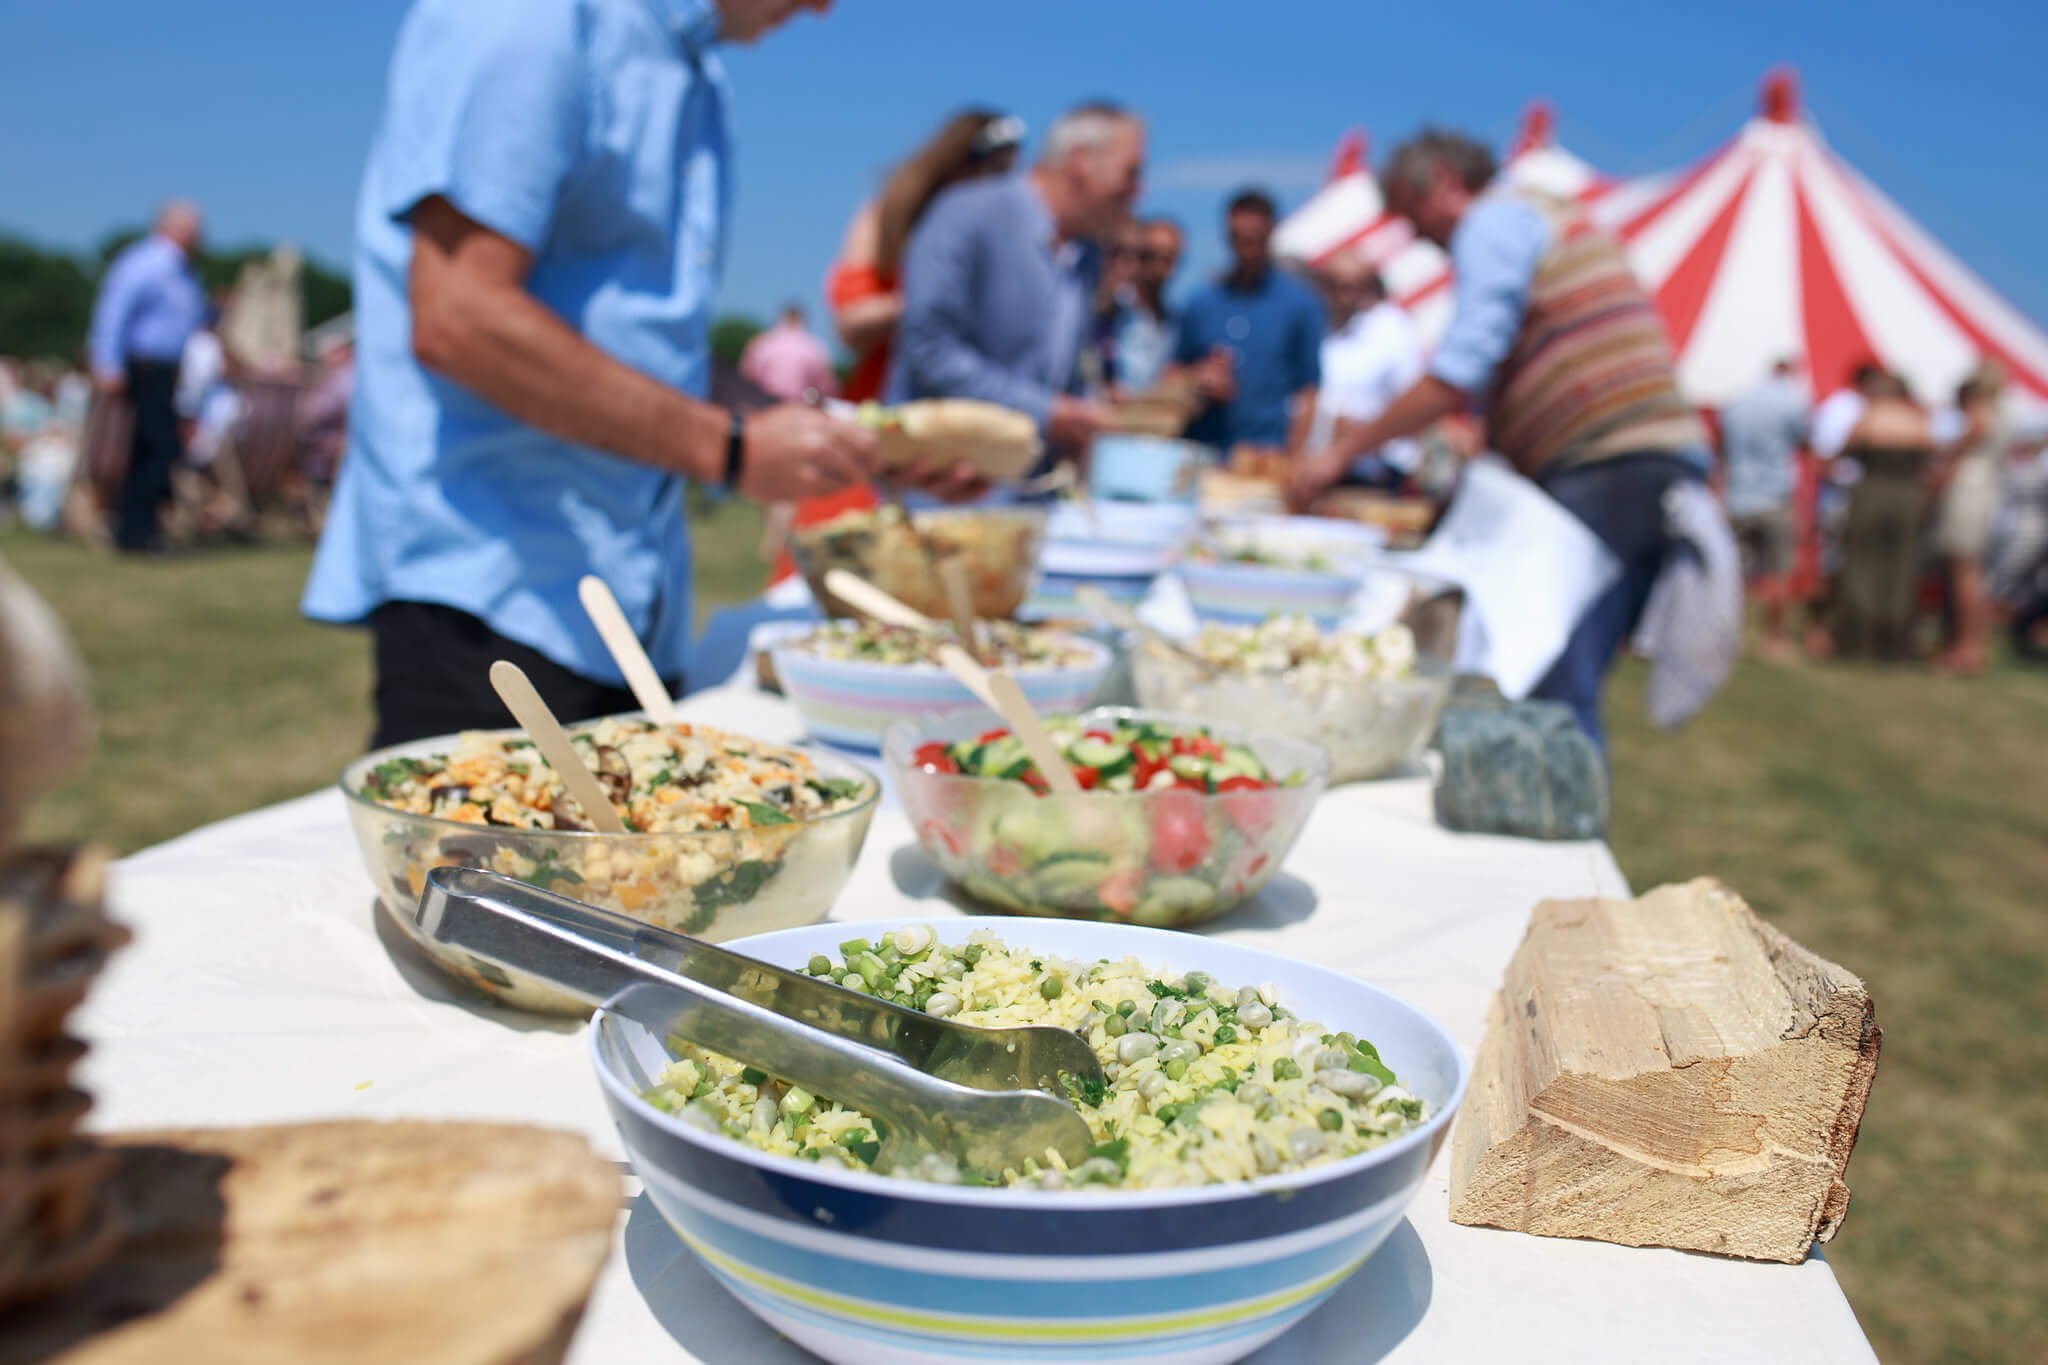 Outdoor buffet at a sunny wedding